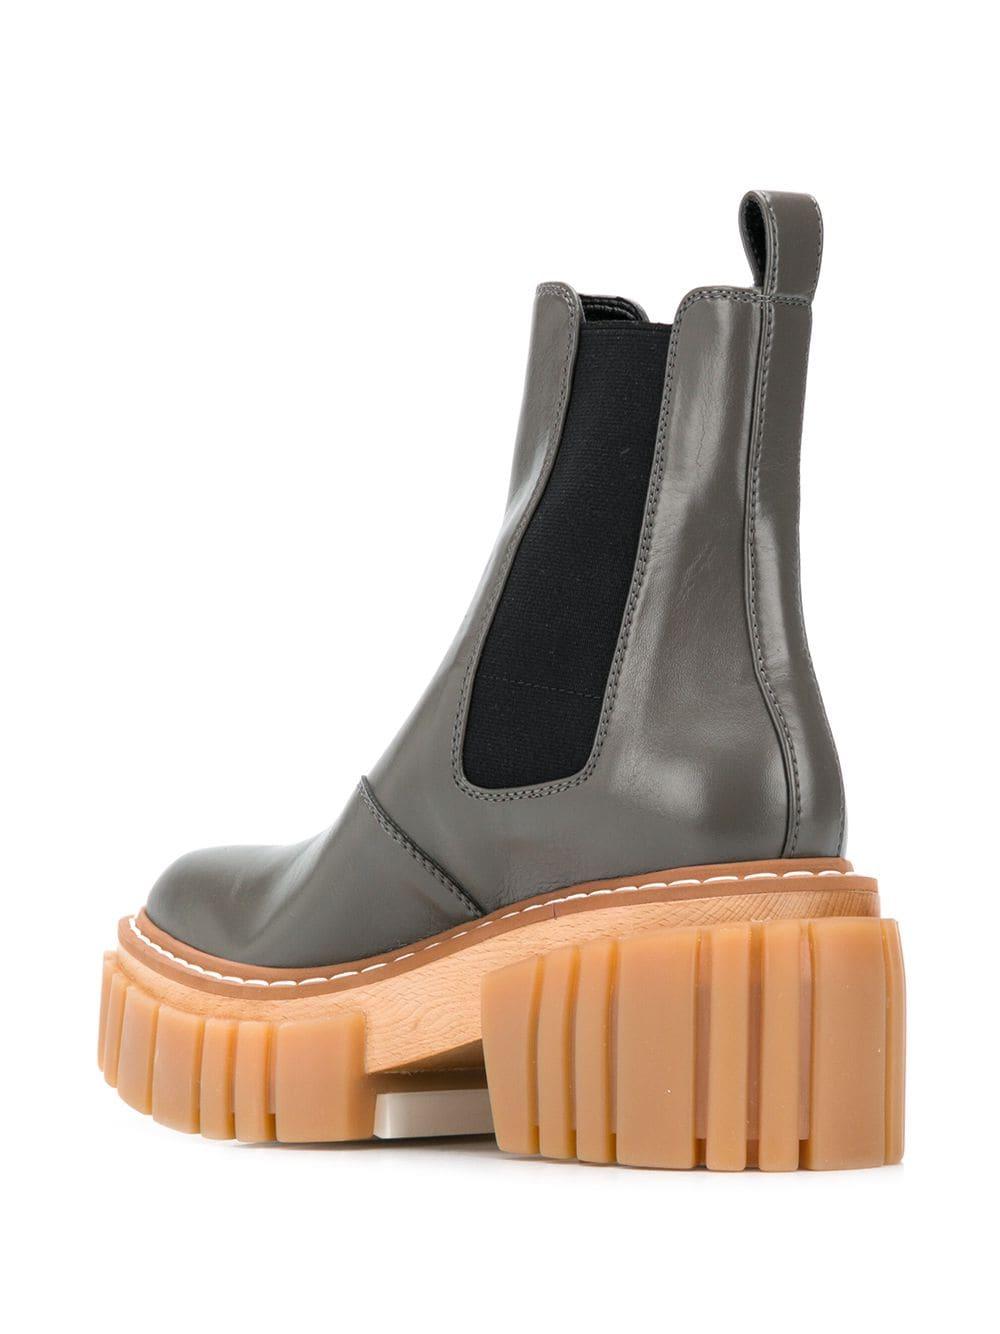 Metallic-green faux leather ridged-platform ankle boots  STELLA MC CARTNEY |  | 800251-N01311160